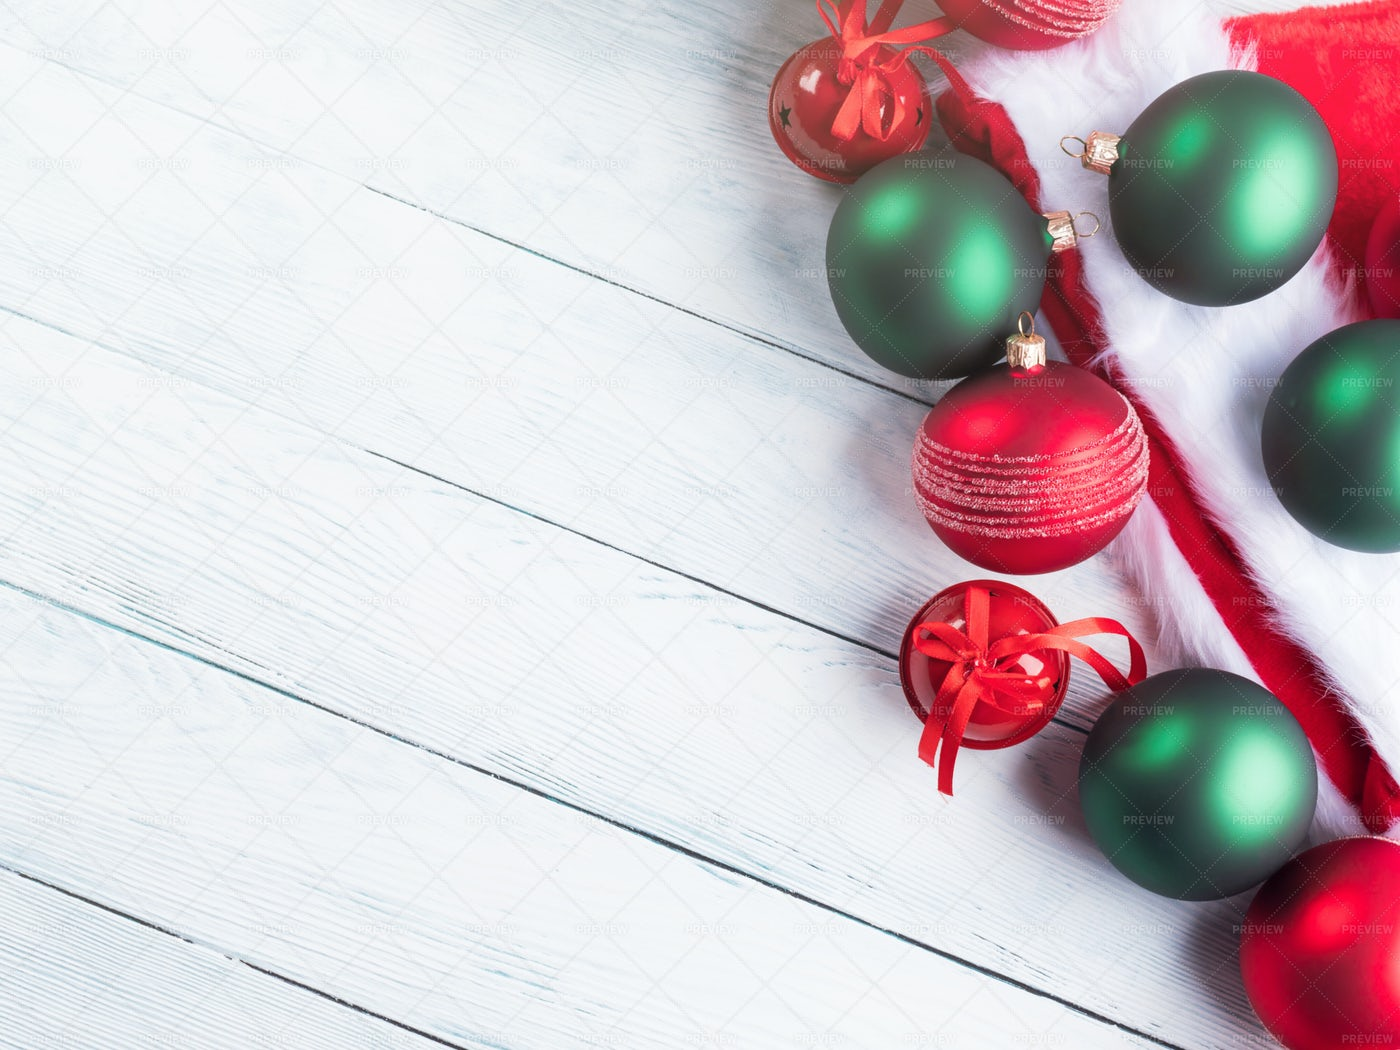 Christmas Decor Background: Stock Photos